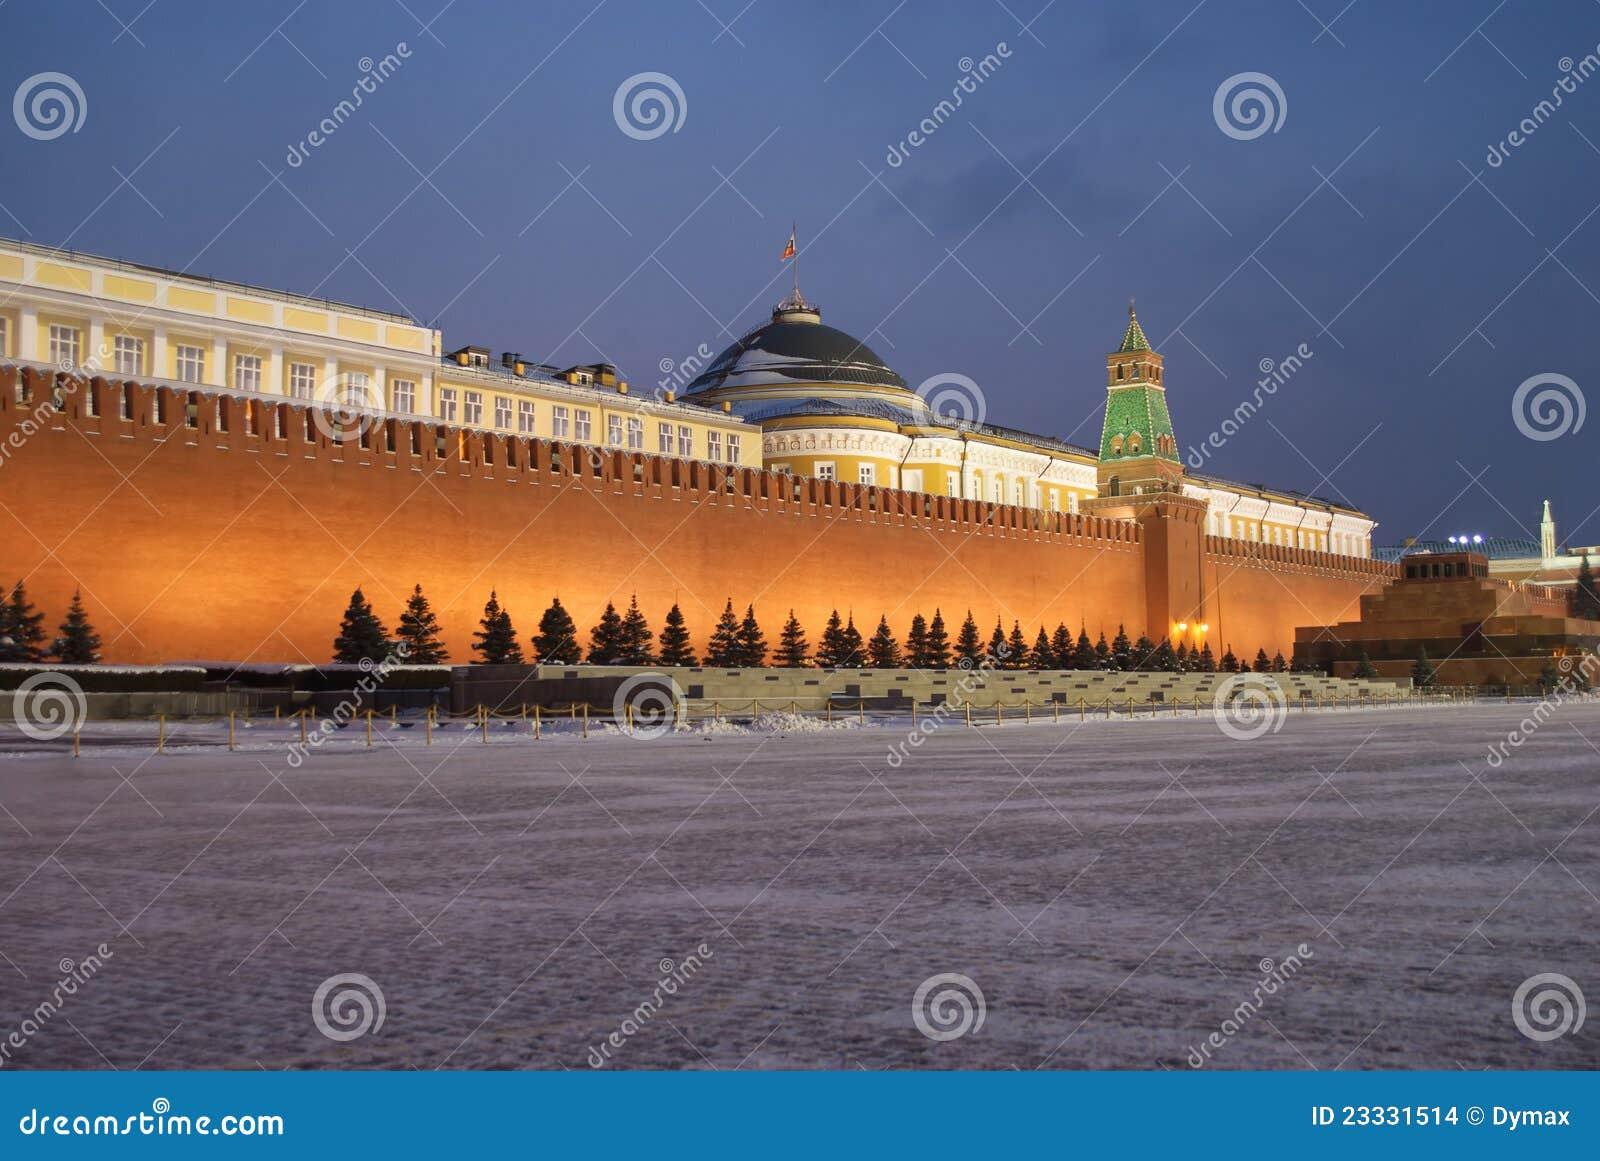 Wand Moskau-Kremlin auf rotem Quadrat nachts Winter